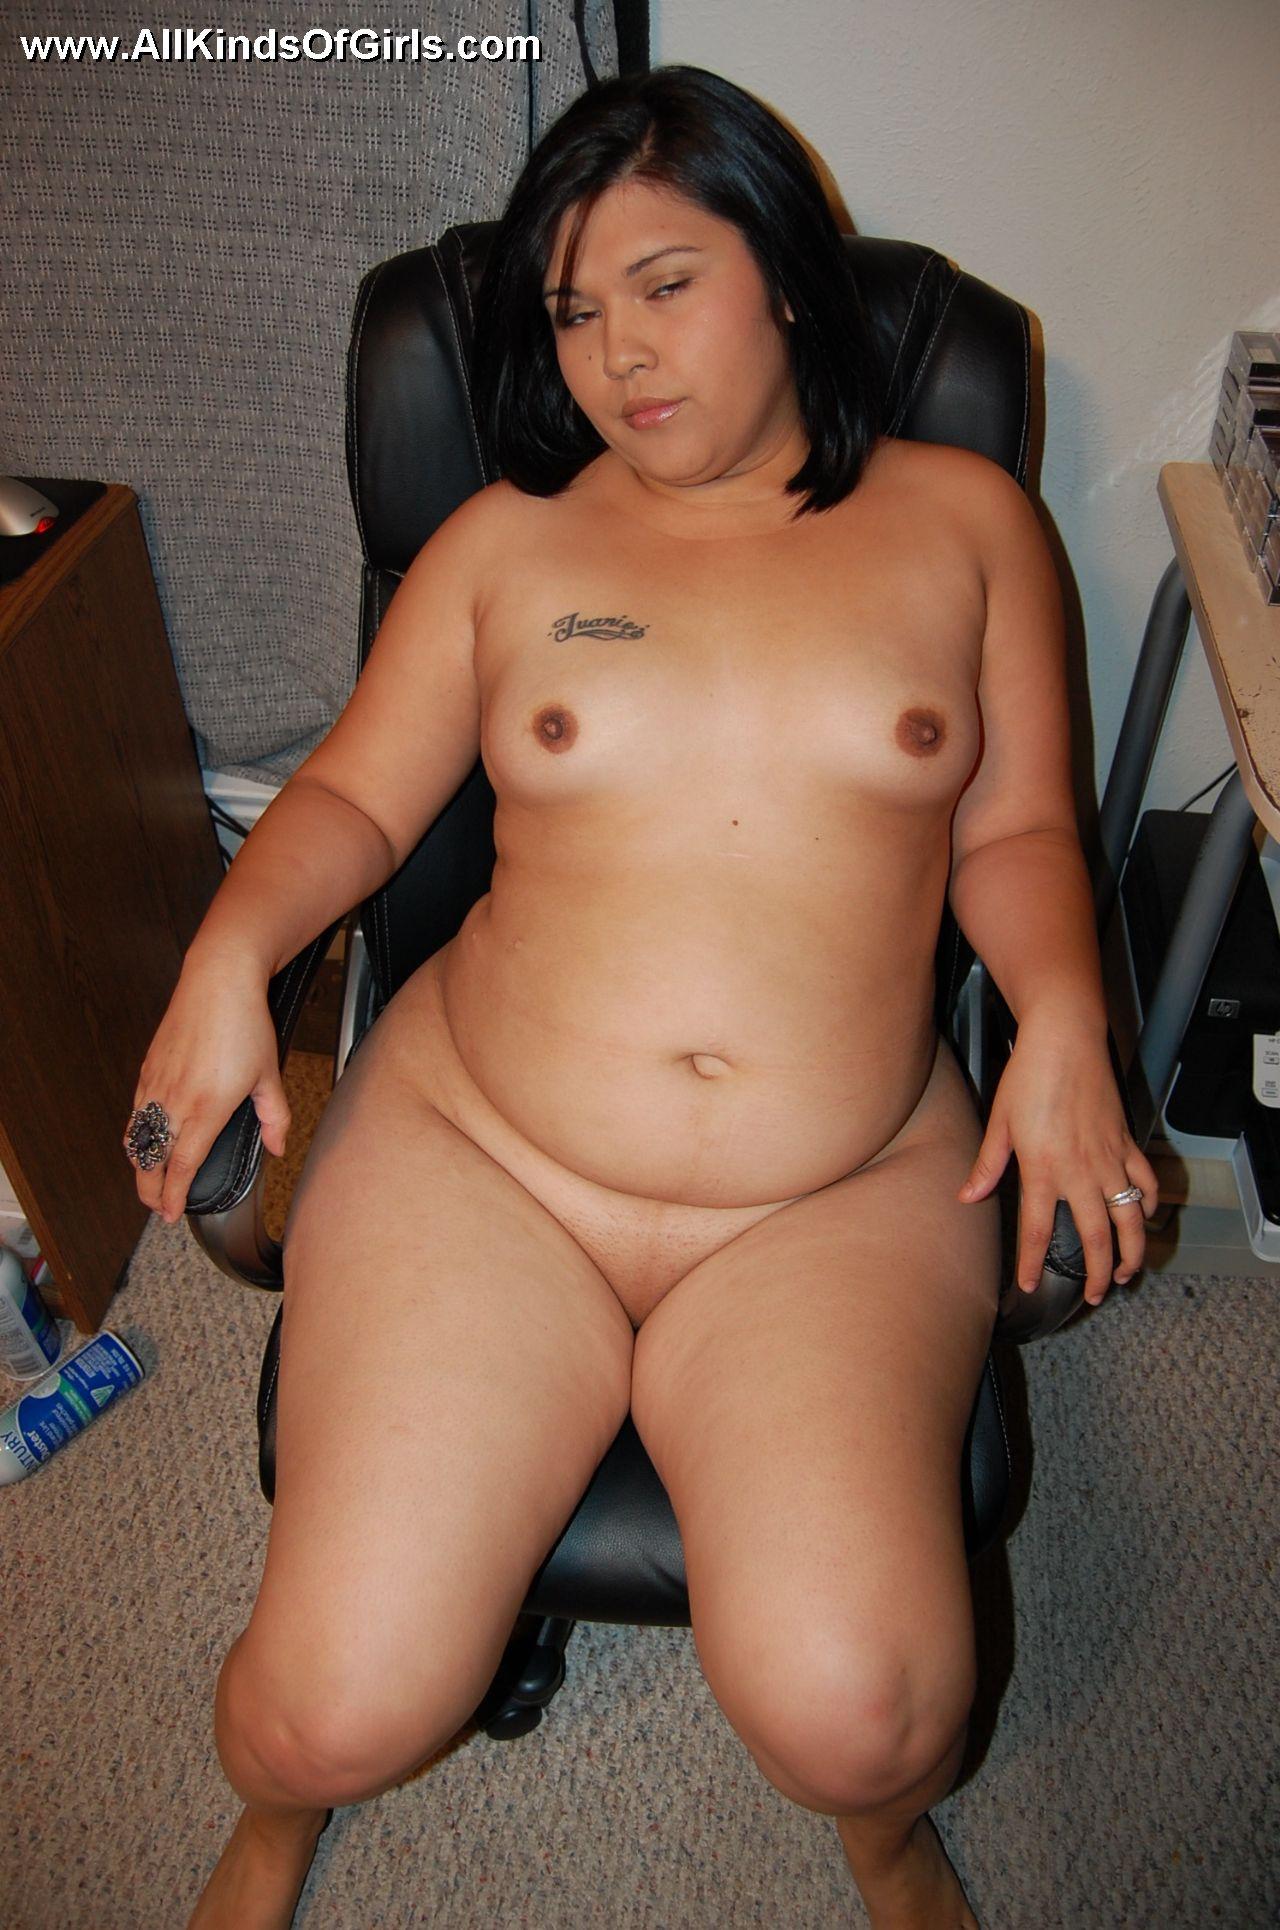 hot disney girls nude